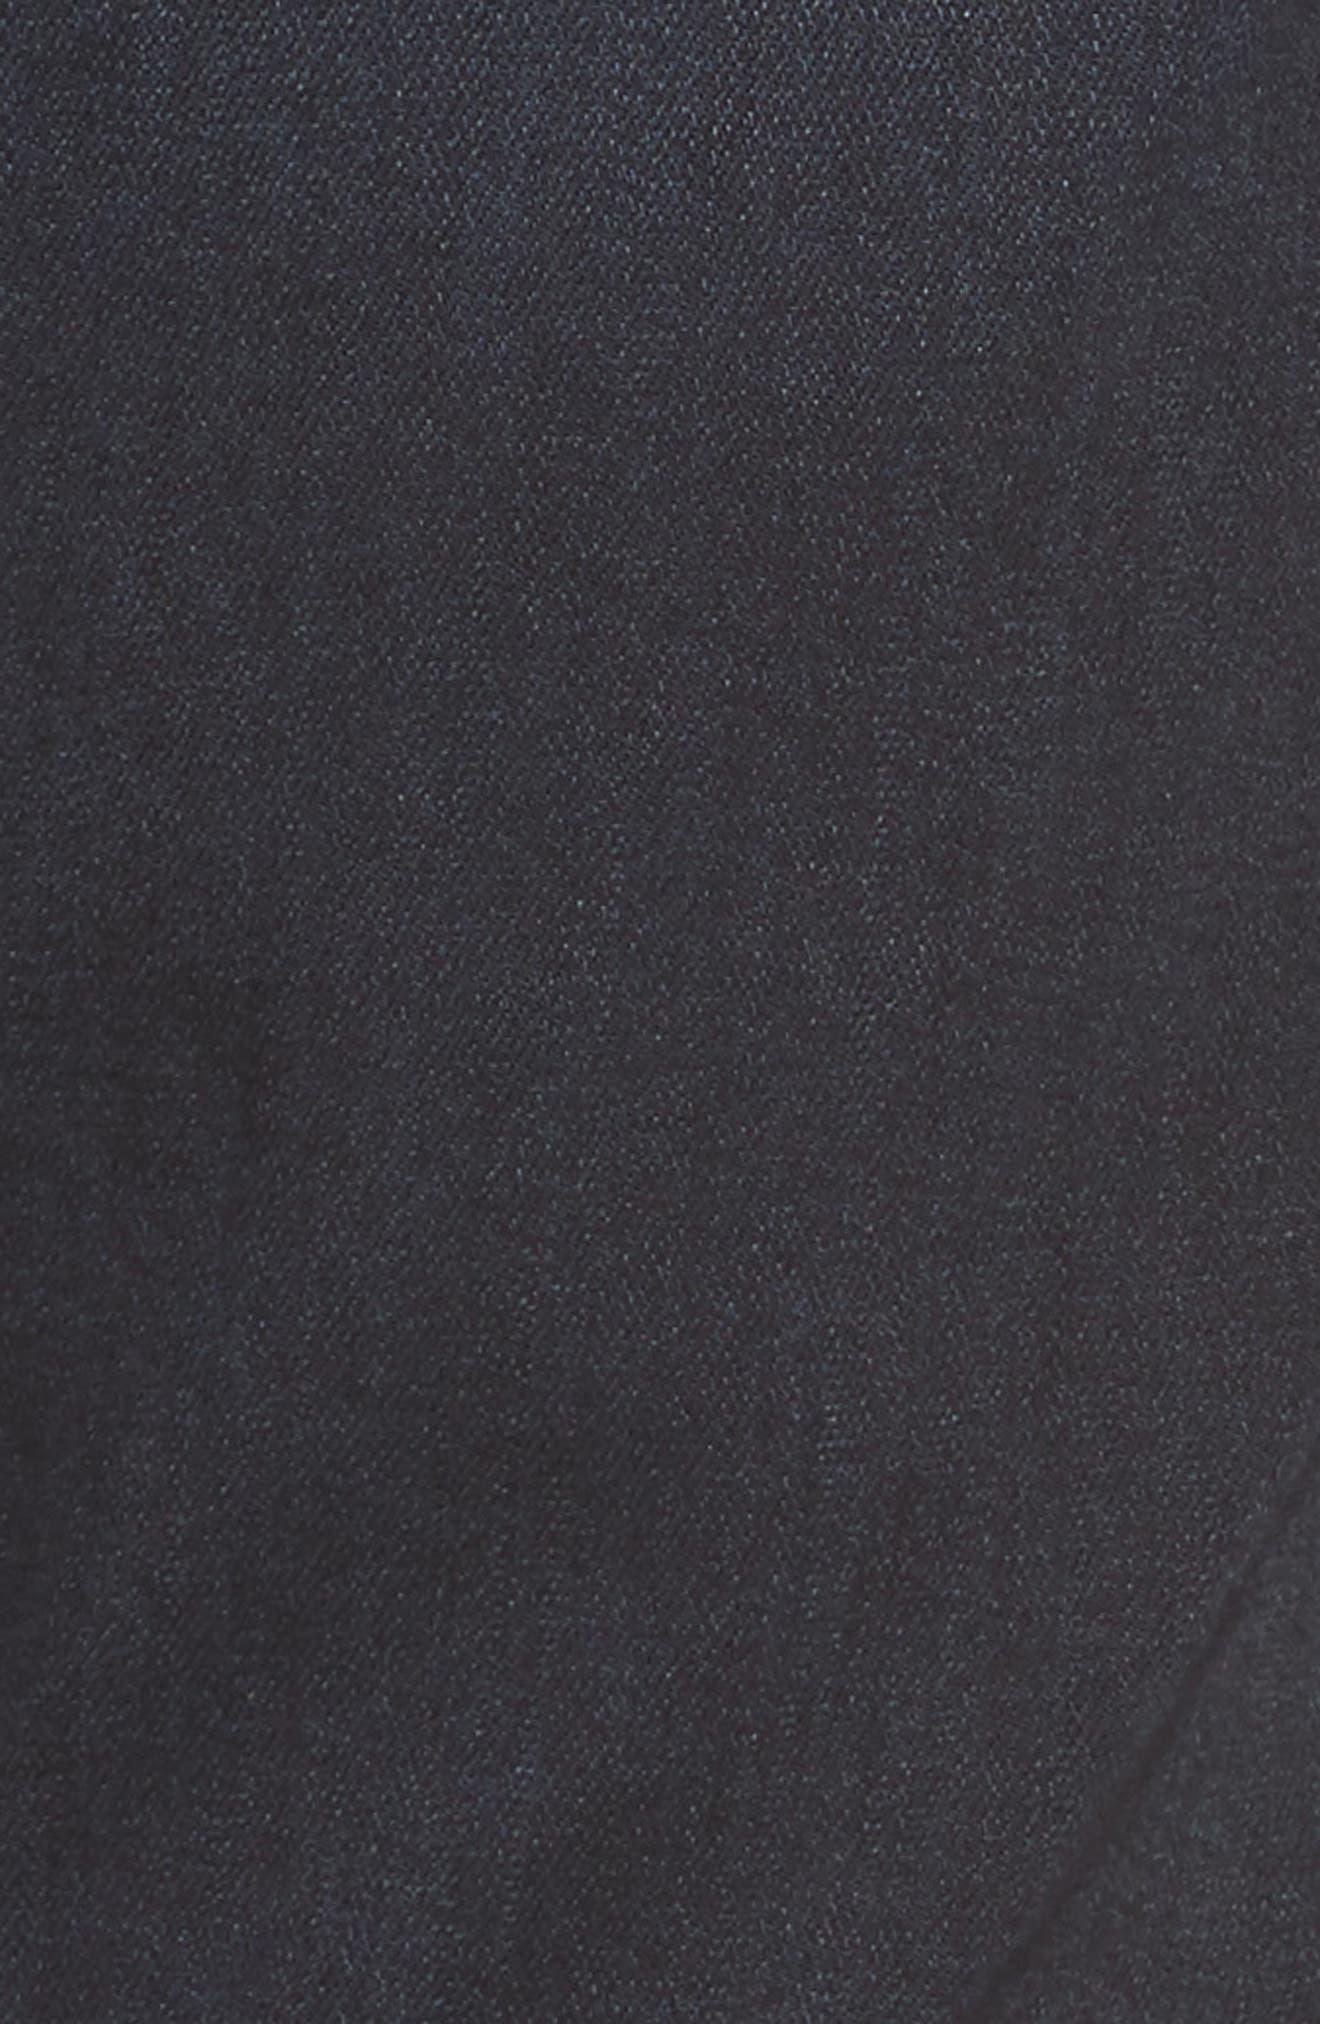 Croft Skinny Fit Jeans,                             Alternate thumbnail 5, color,                             400